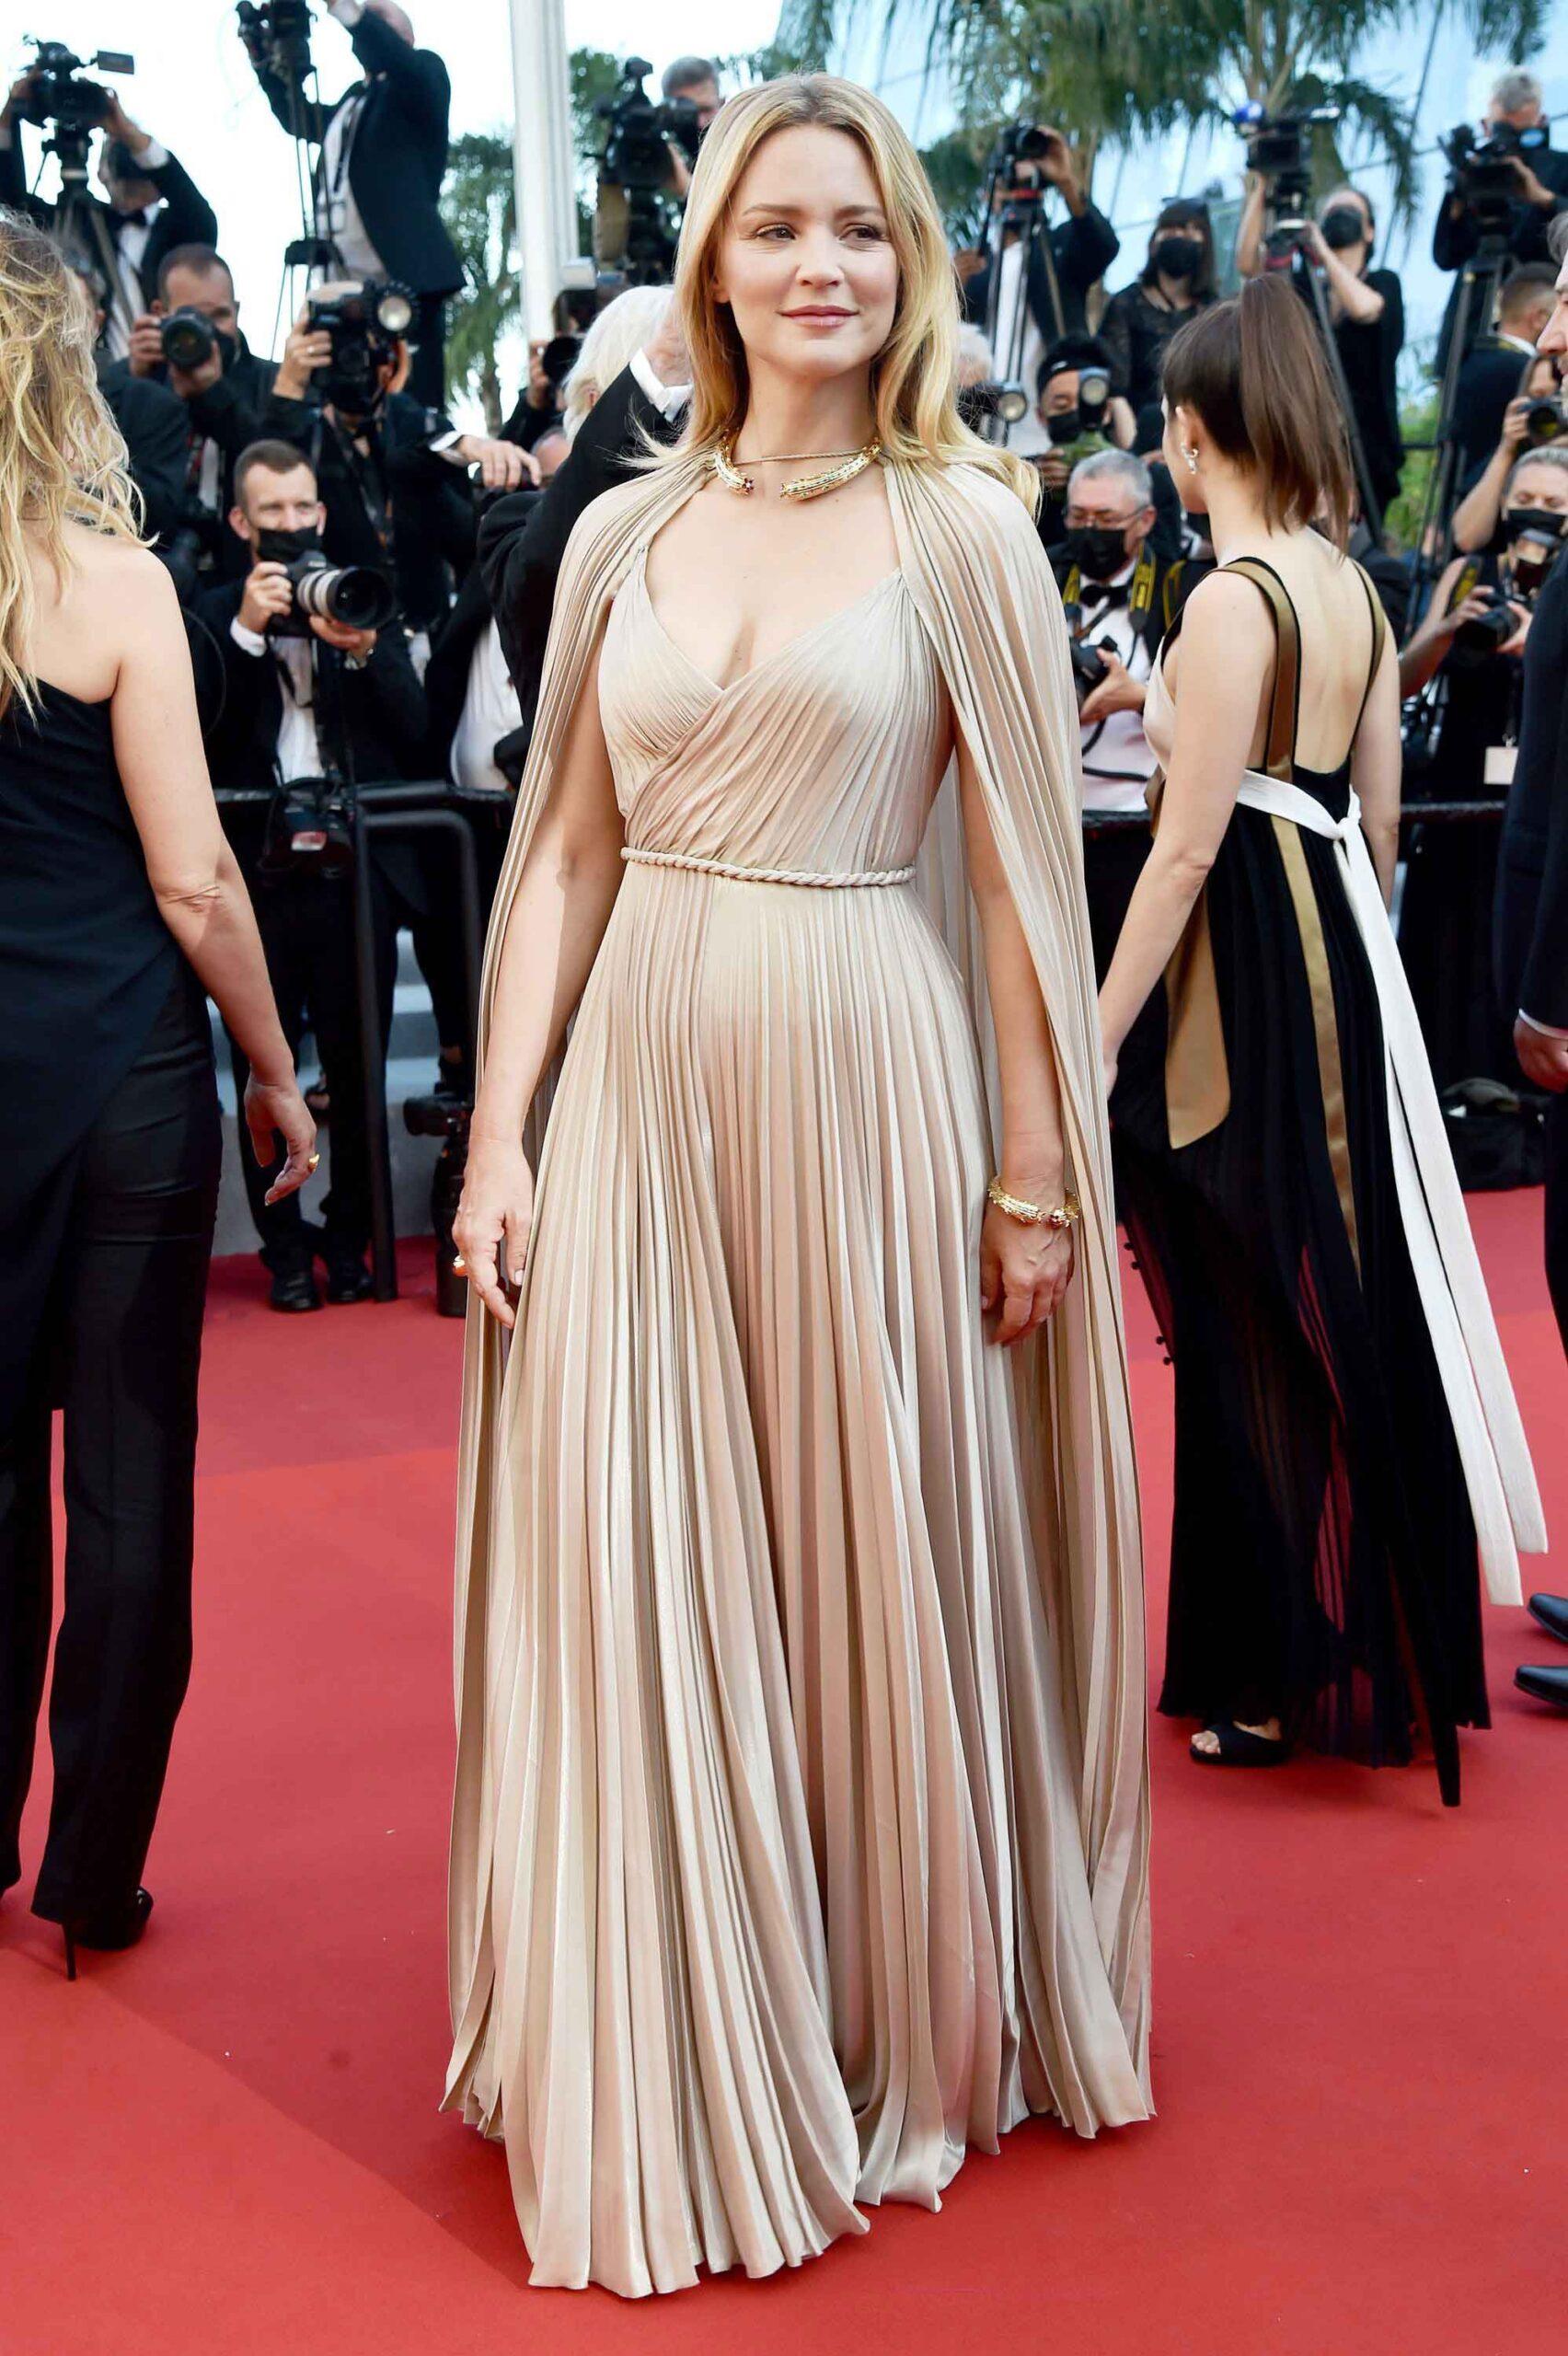 Cannes Filmfestival 2021. De mooiste rode loper looks